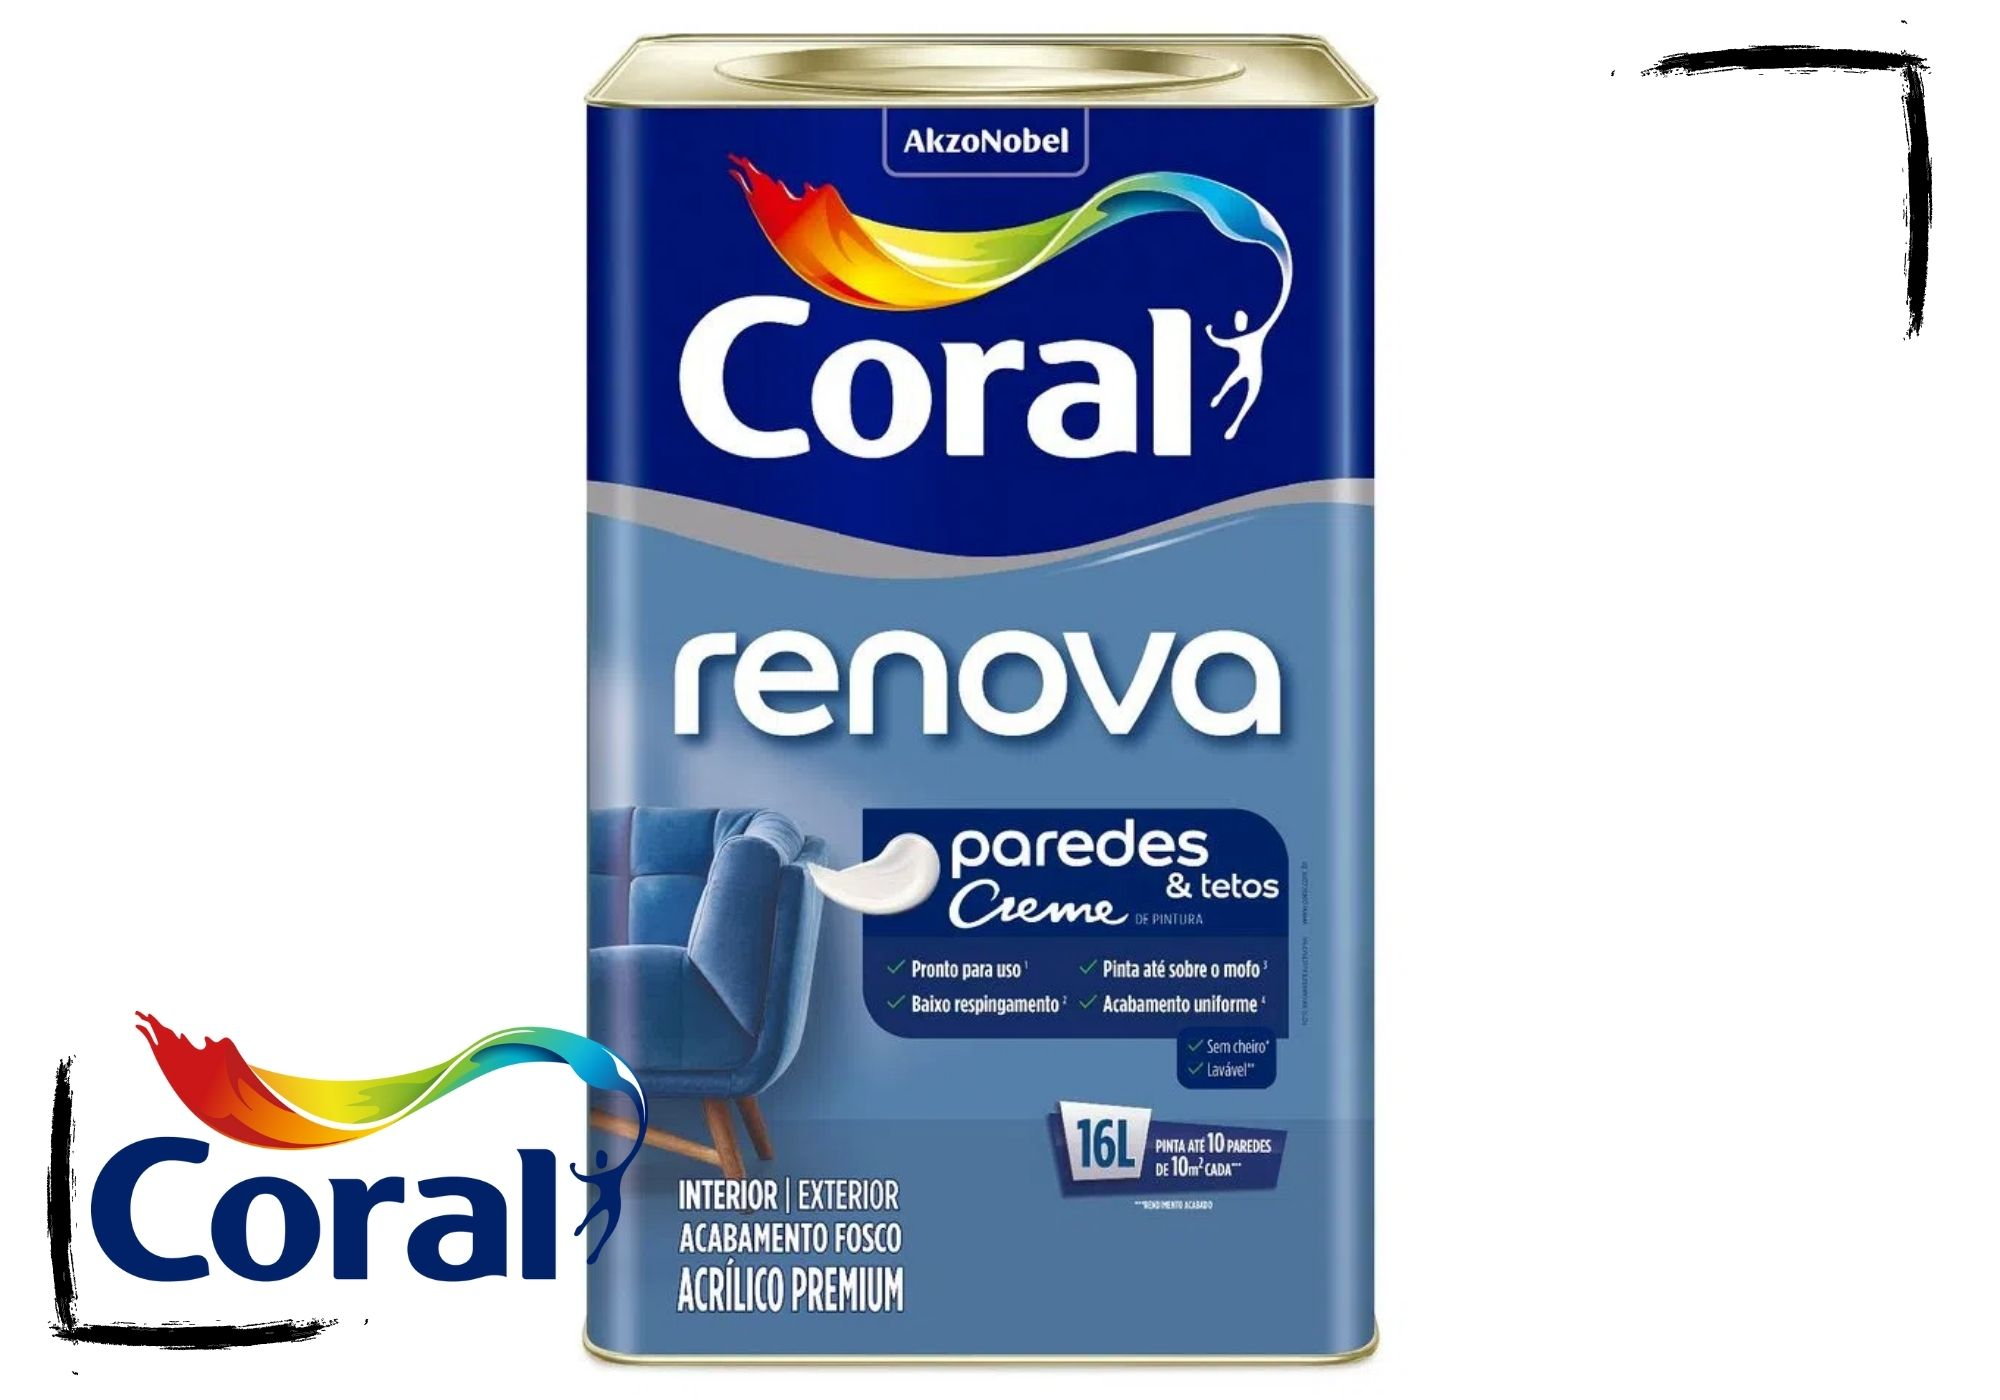 Coral Renova Creme Paredes&Tetos Antimofo 16L